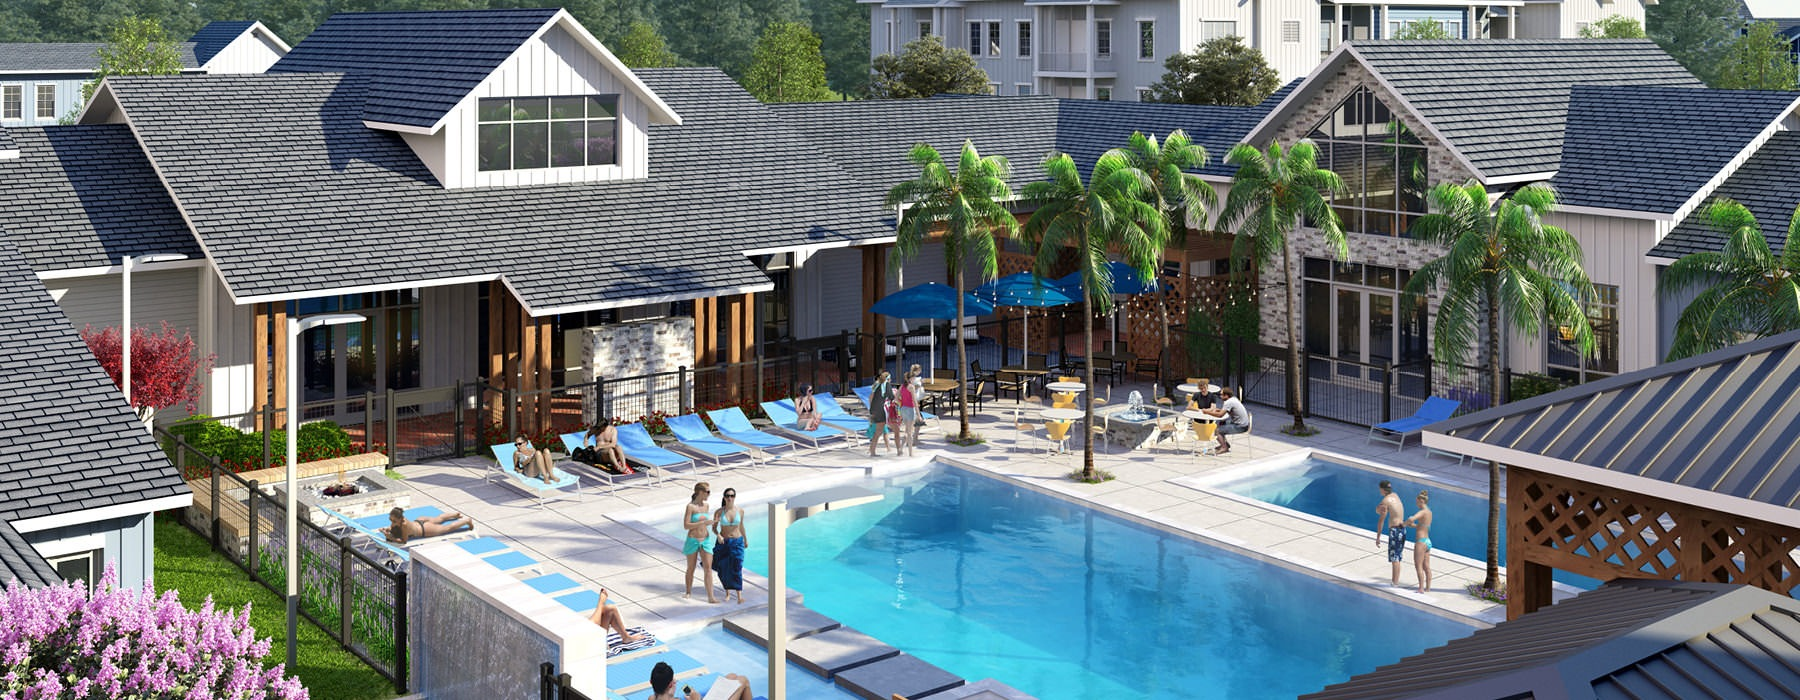 rendering of outdoor swimming pool area